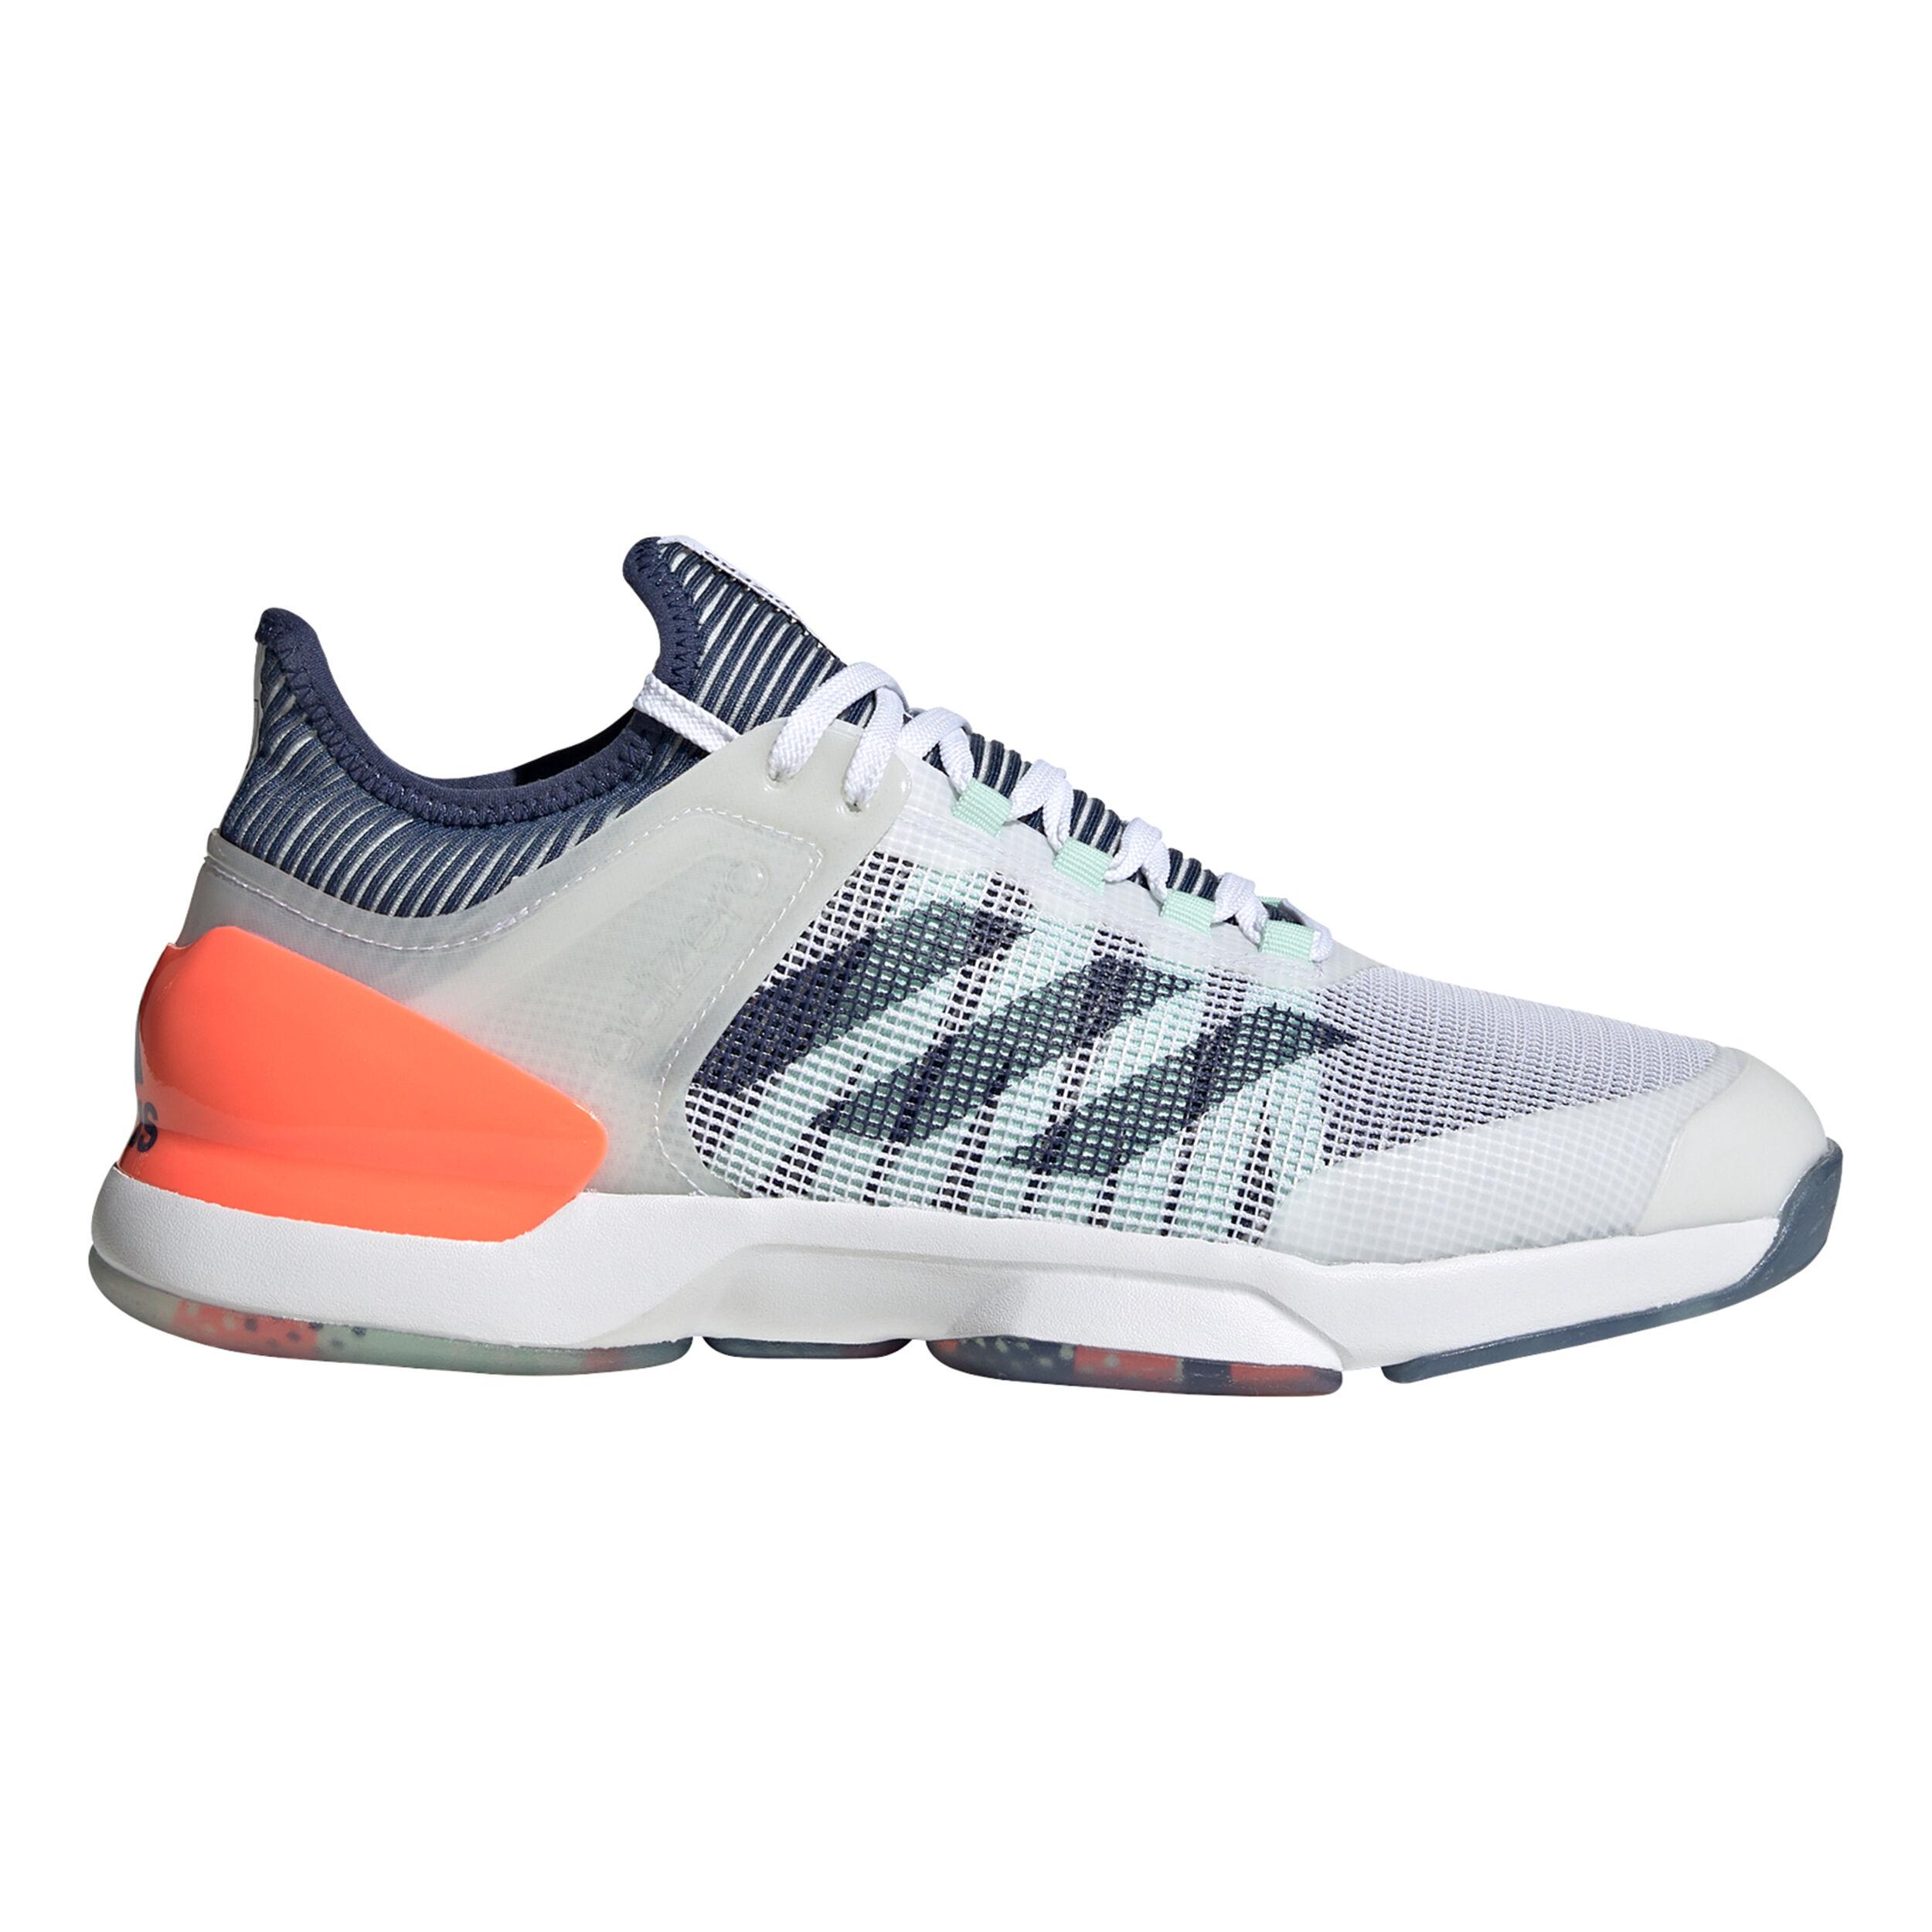 Adizero Ubersonic 2 Chaussures Toutes Surfaces Hommes Blanc , Bleu F